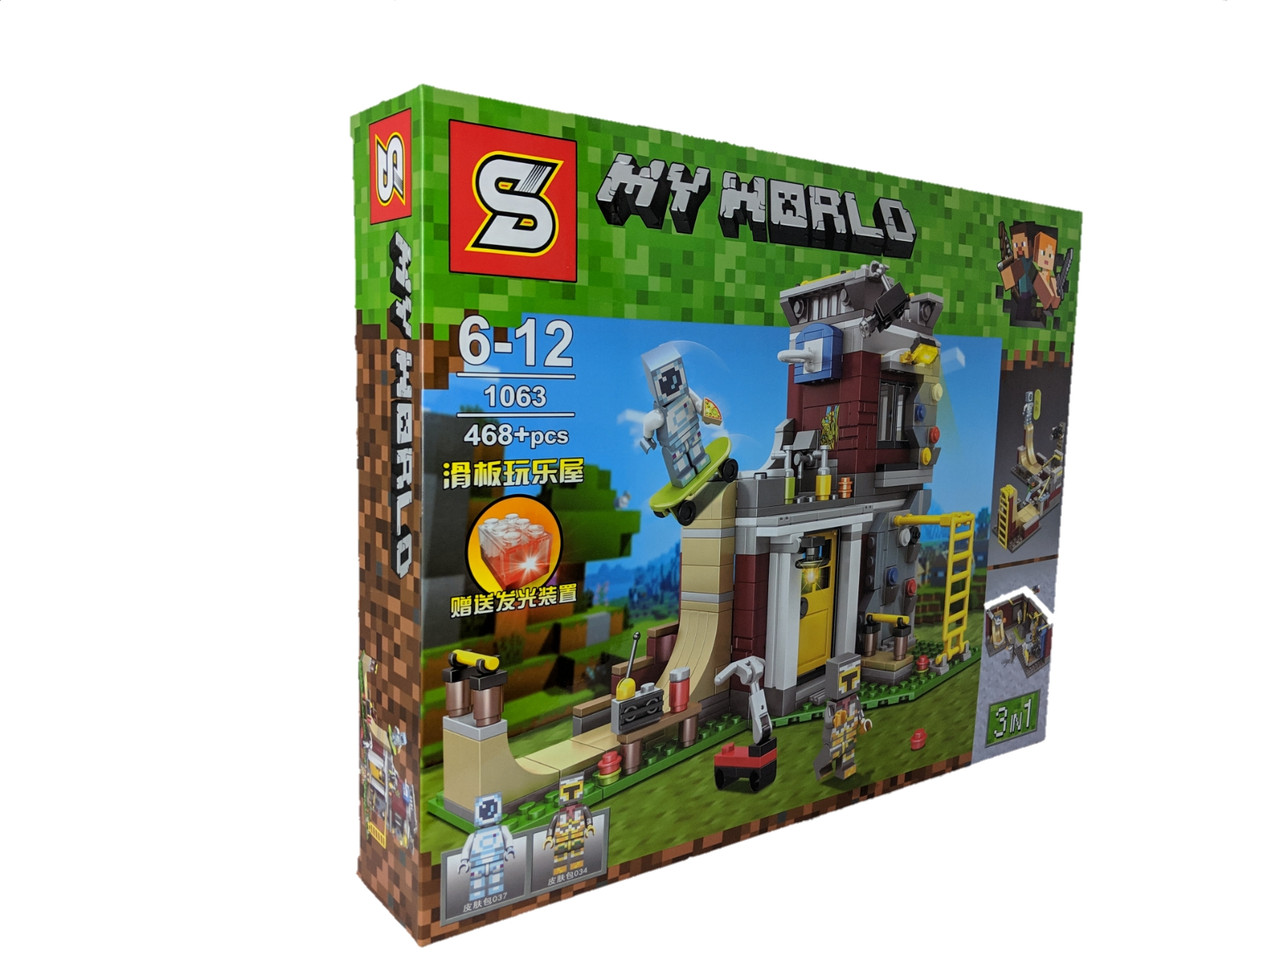 Конструктор My World 468 дет. ( копия Minecraft) 1063